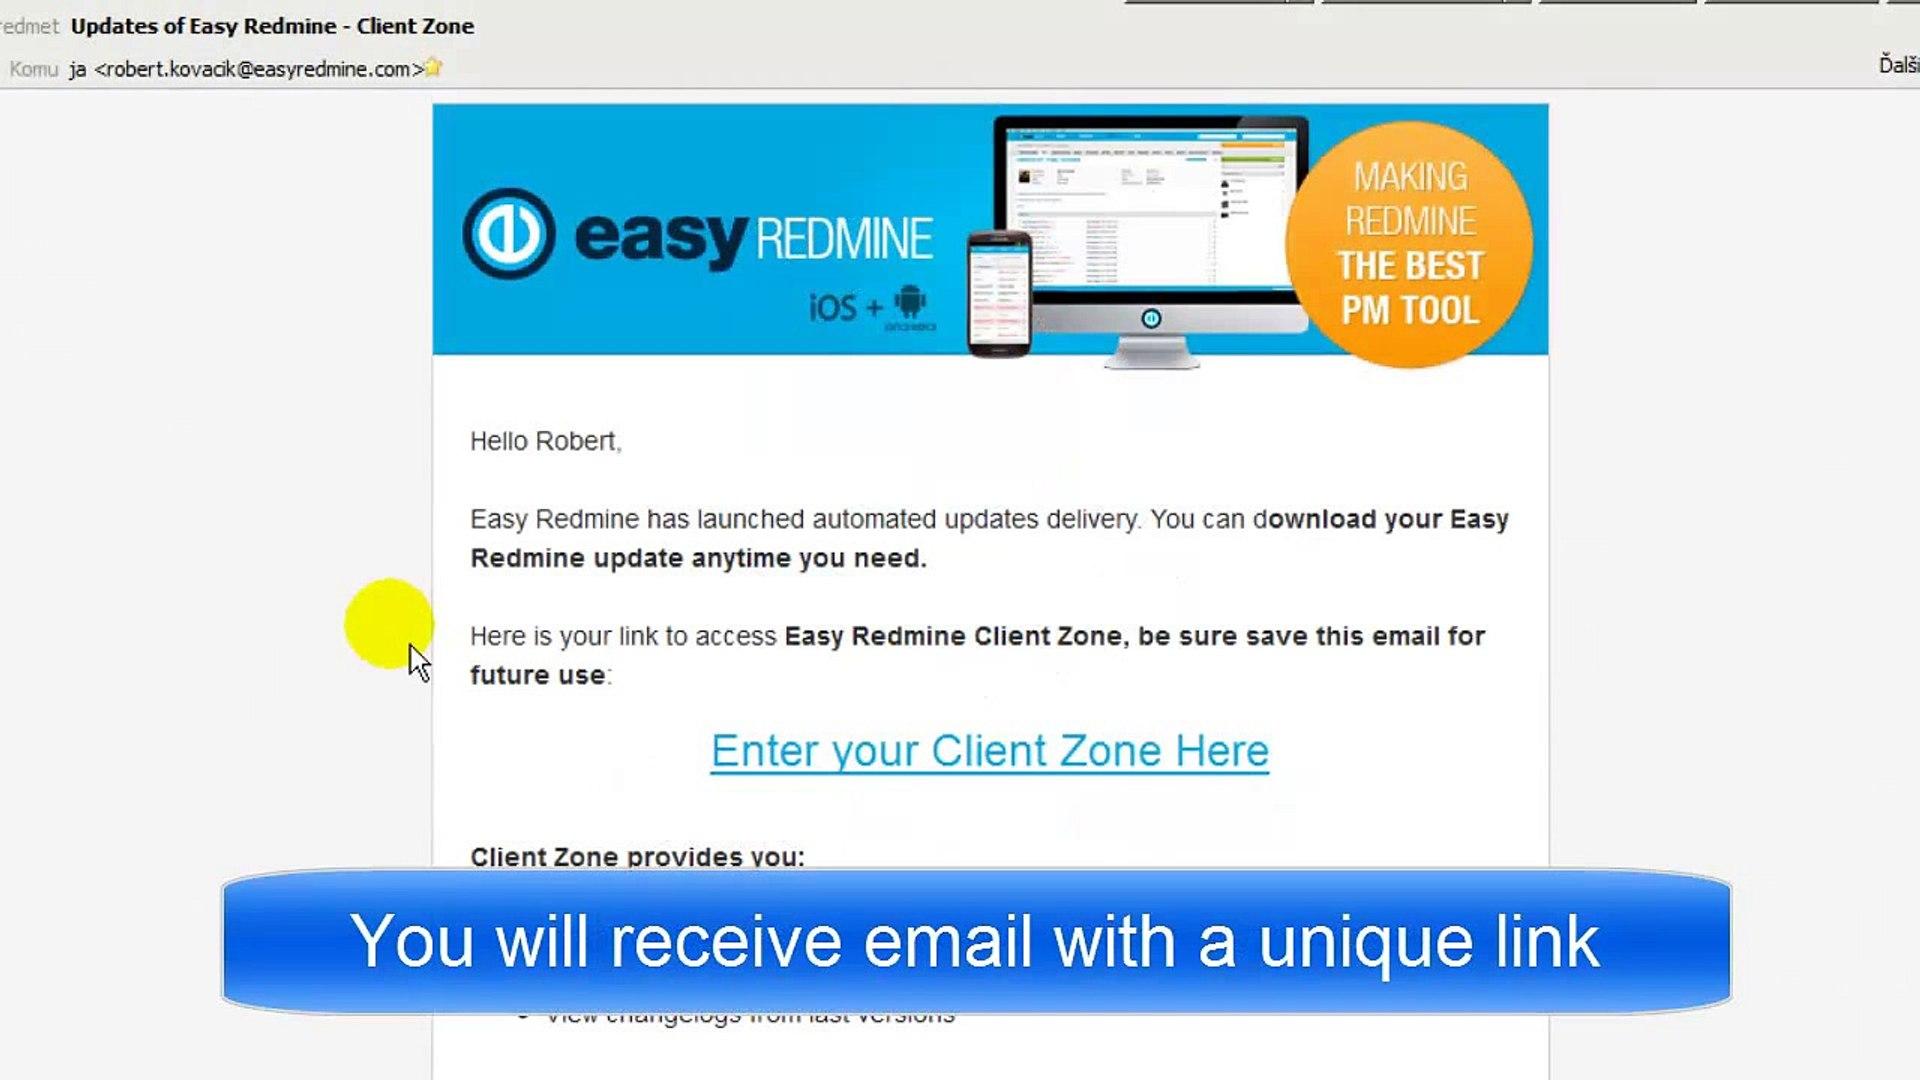 Easy Redmine extending services - Client Zone